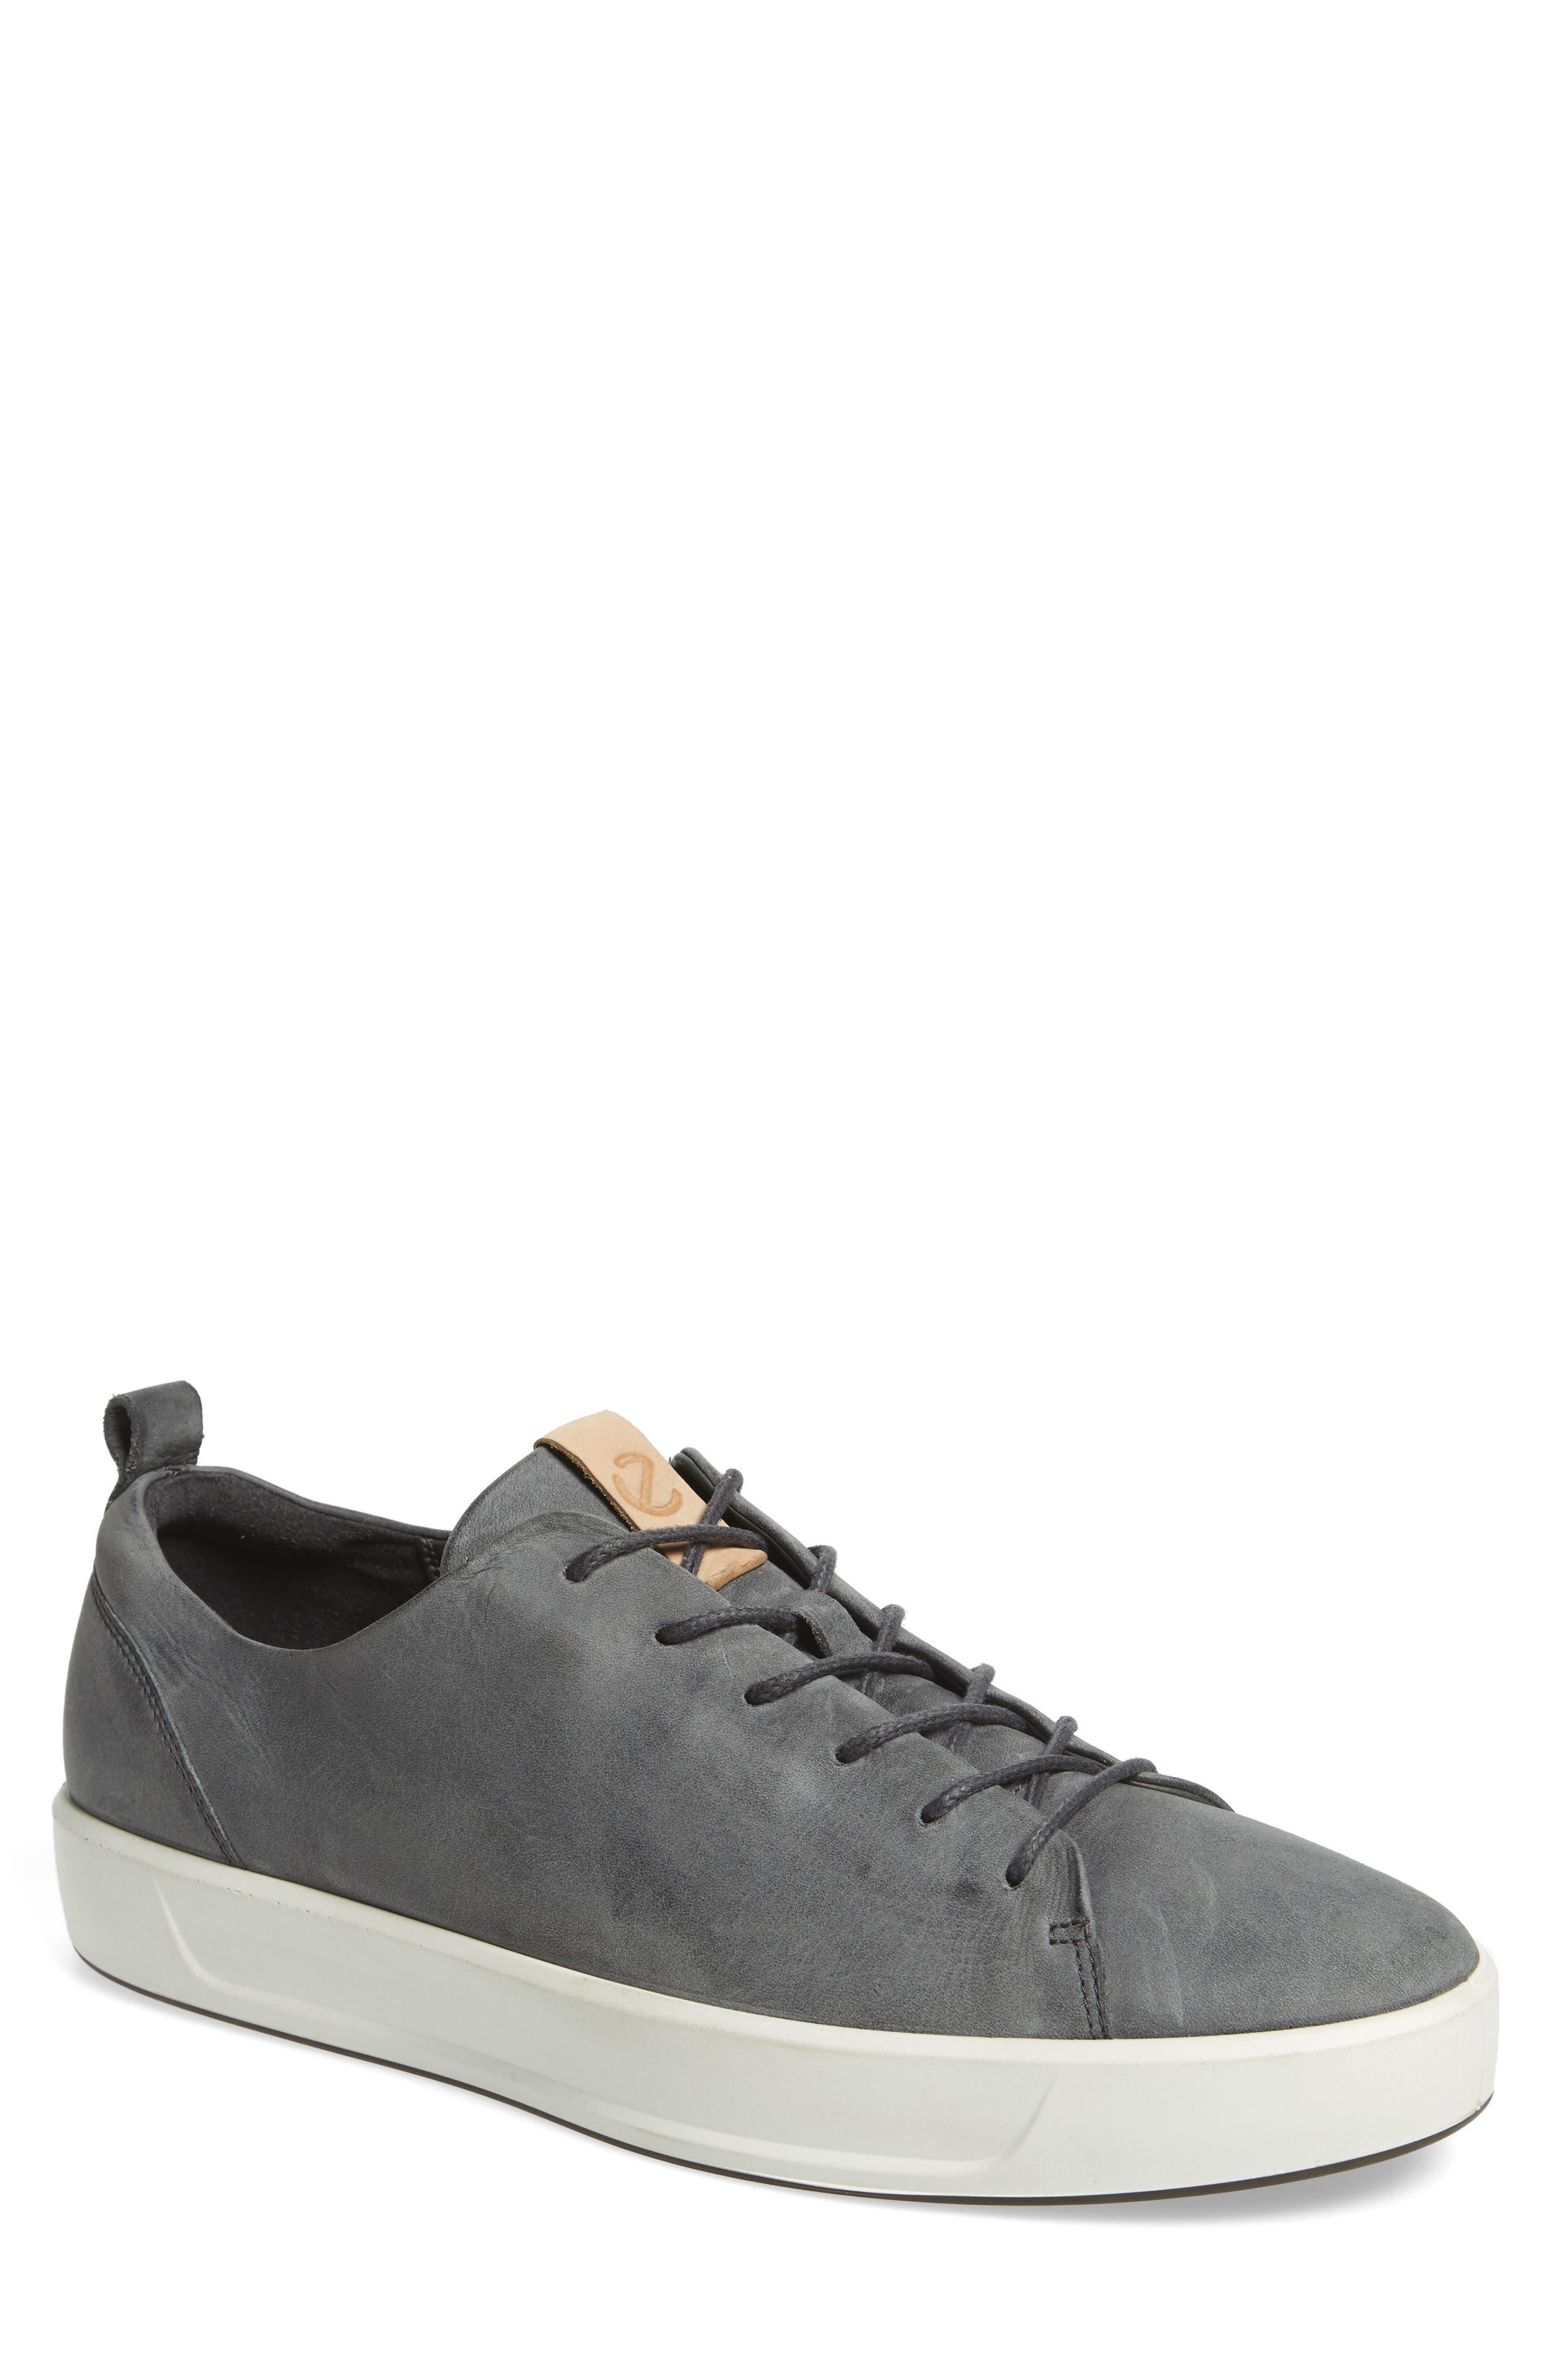 Soft 8 Sneaker,                             Main thumbnail 1, color,                             025